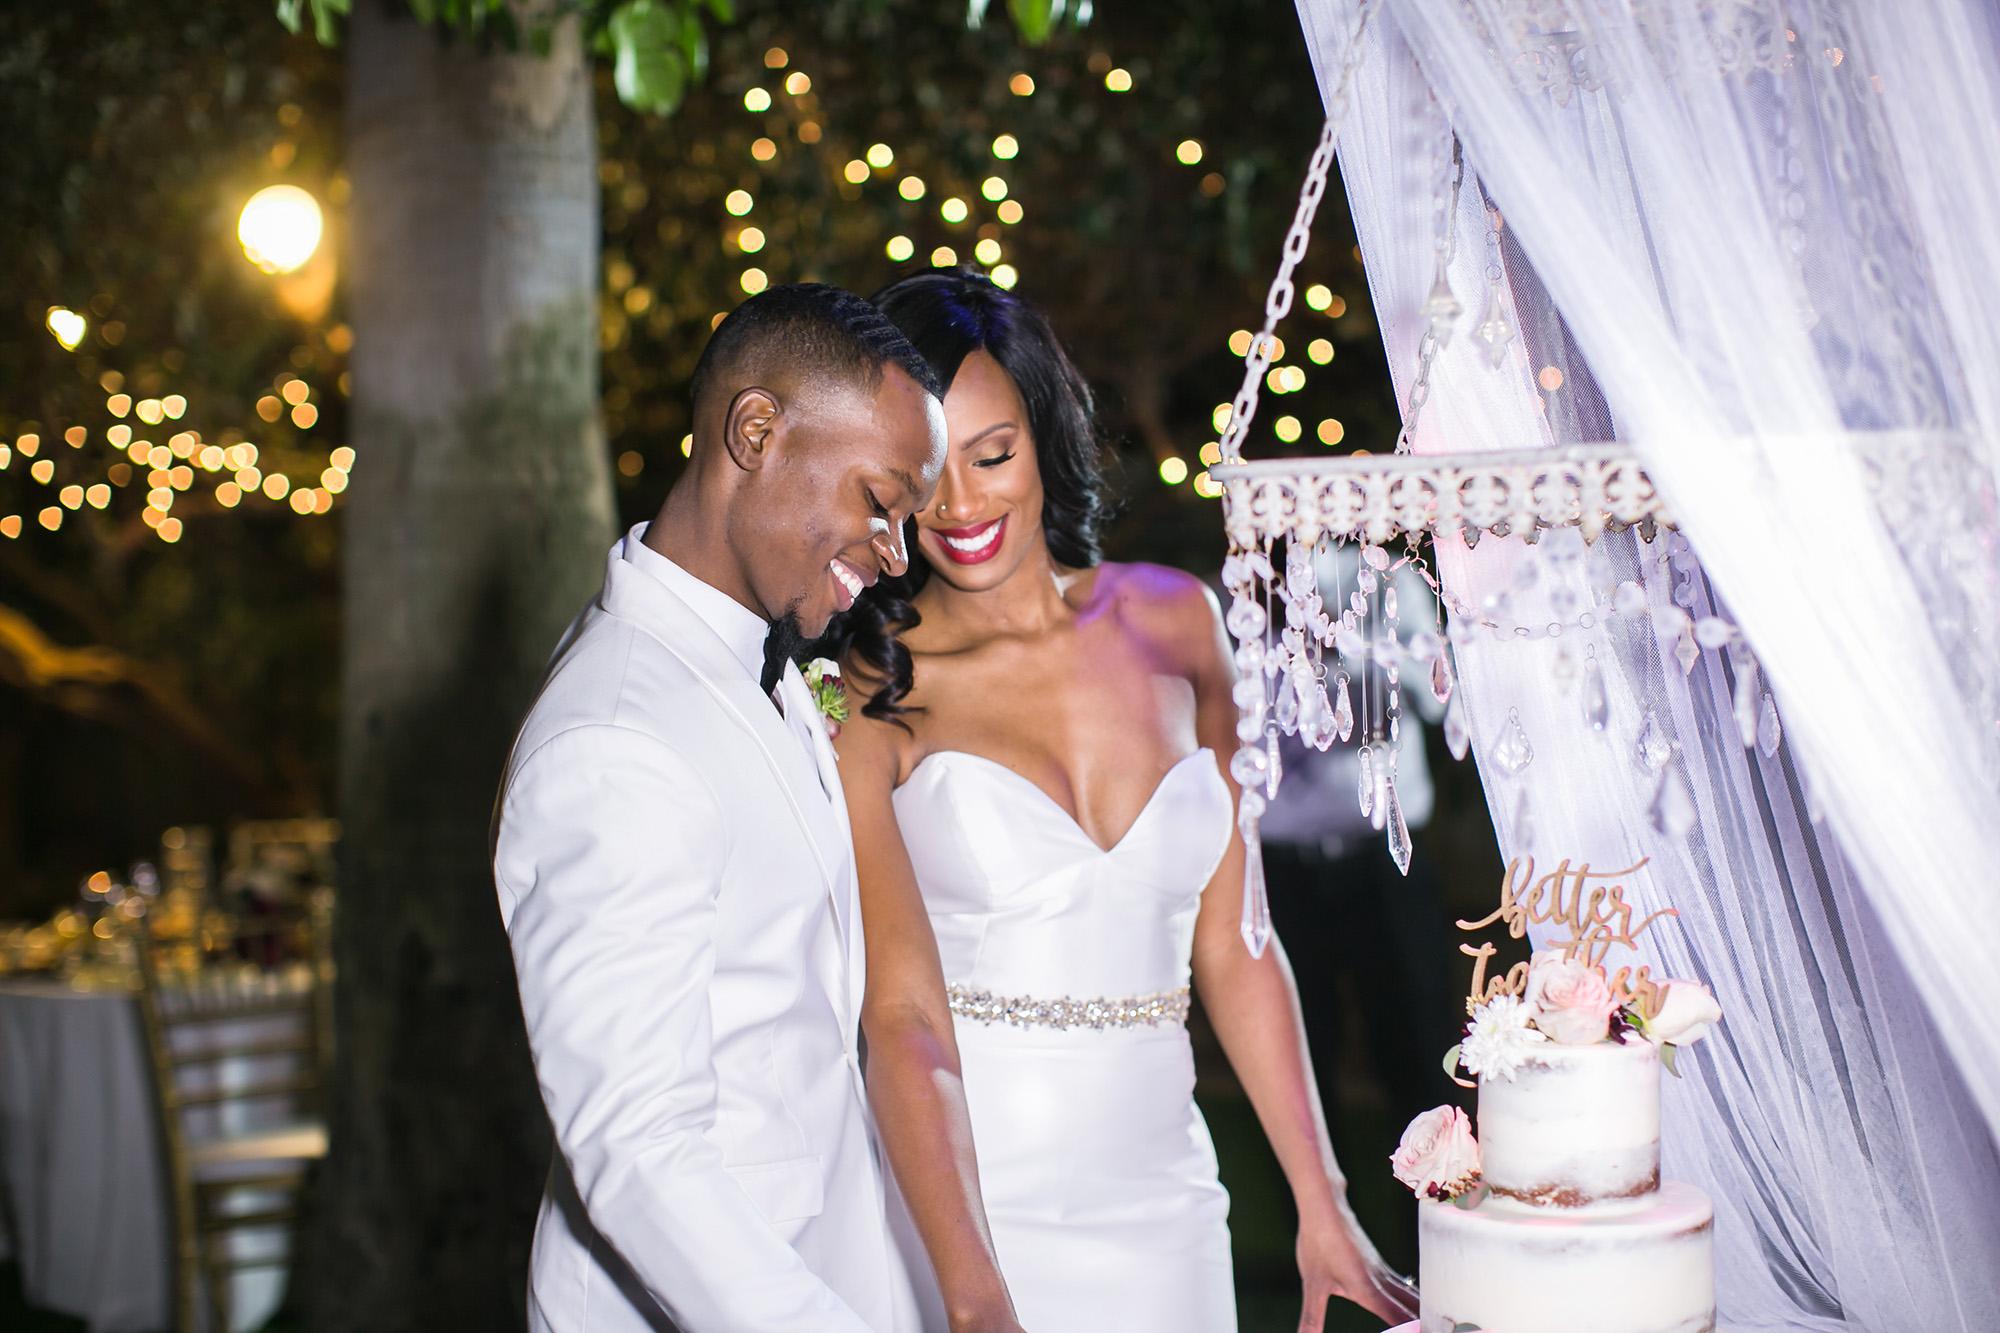 associate-photographer-christmas-house-wedding-carrie-vines-0041.jpg